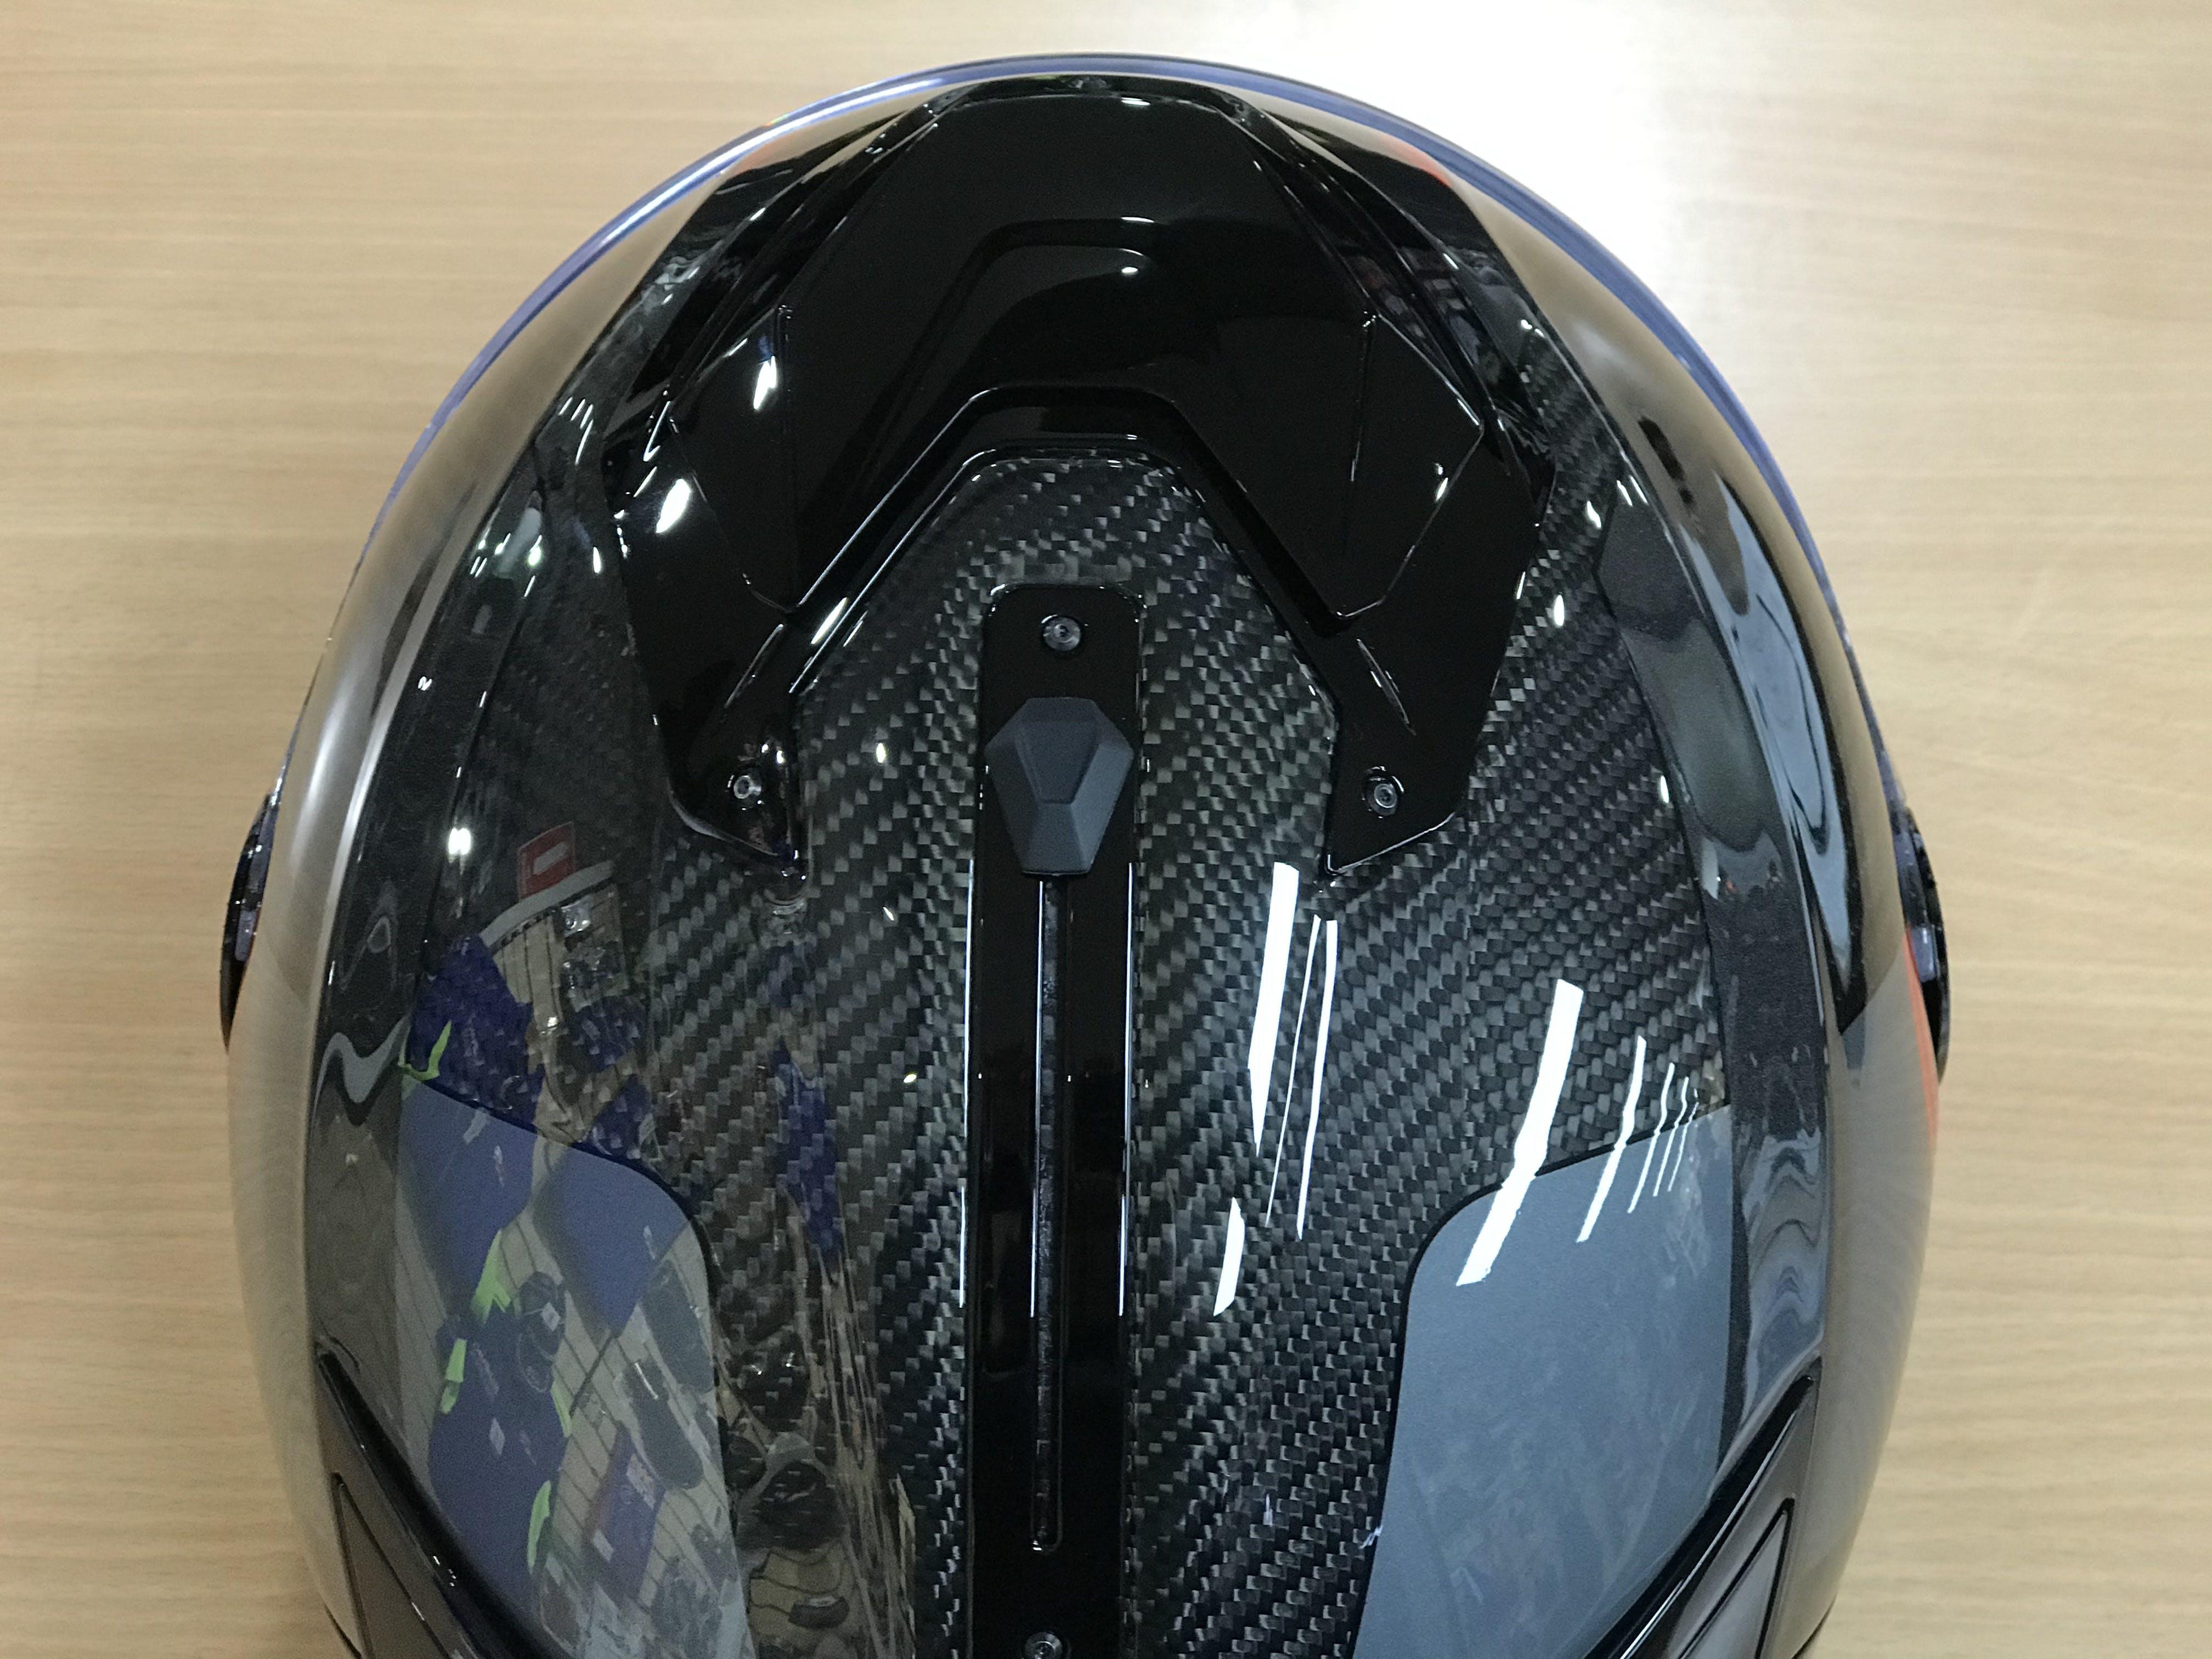 The new rubber internal sun visor slider on the Shark Carbon Spartan GT